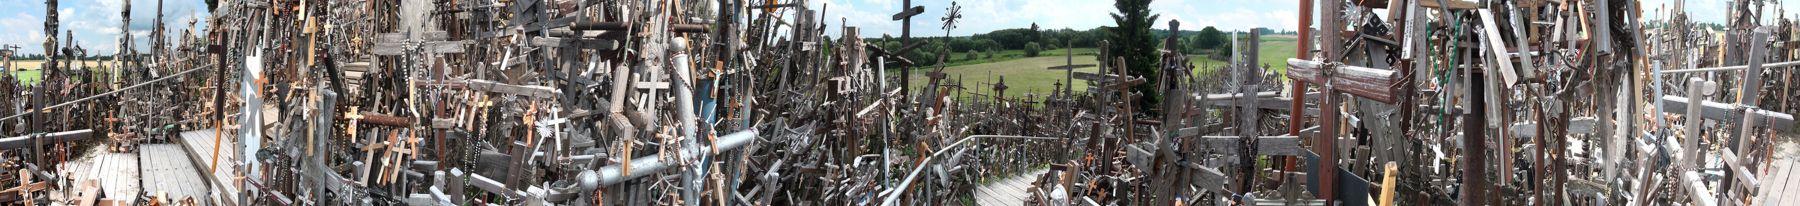 La colina de las cruces (Lituania) (2012) - Miriam Durango